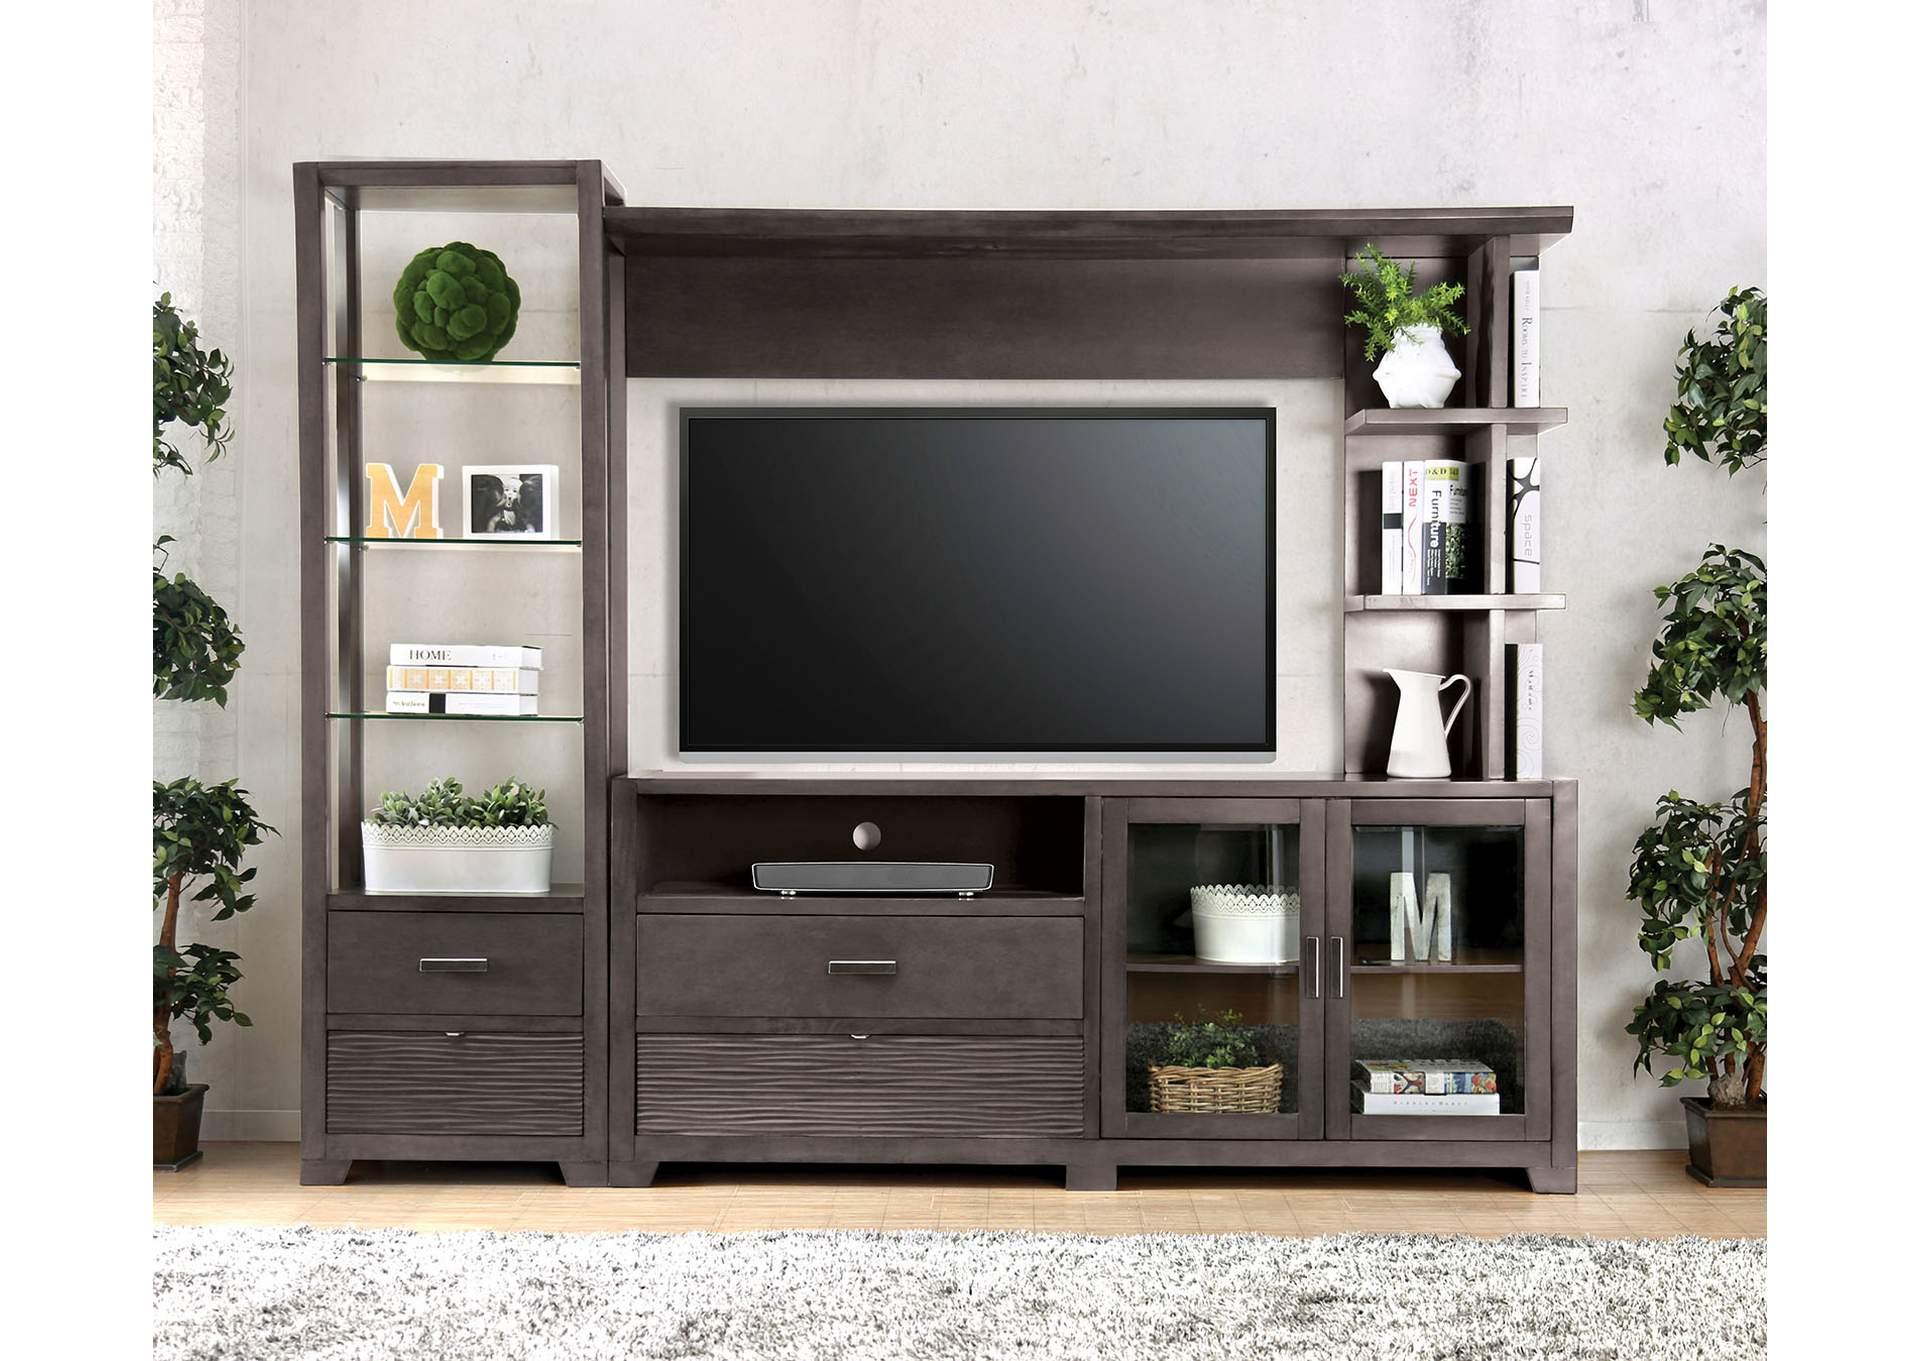 furniture of tv living room design rh uujuooozau xklusiv store furniture tv cabinet furniture tv set